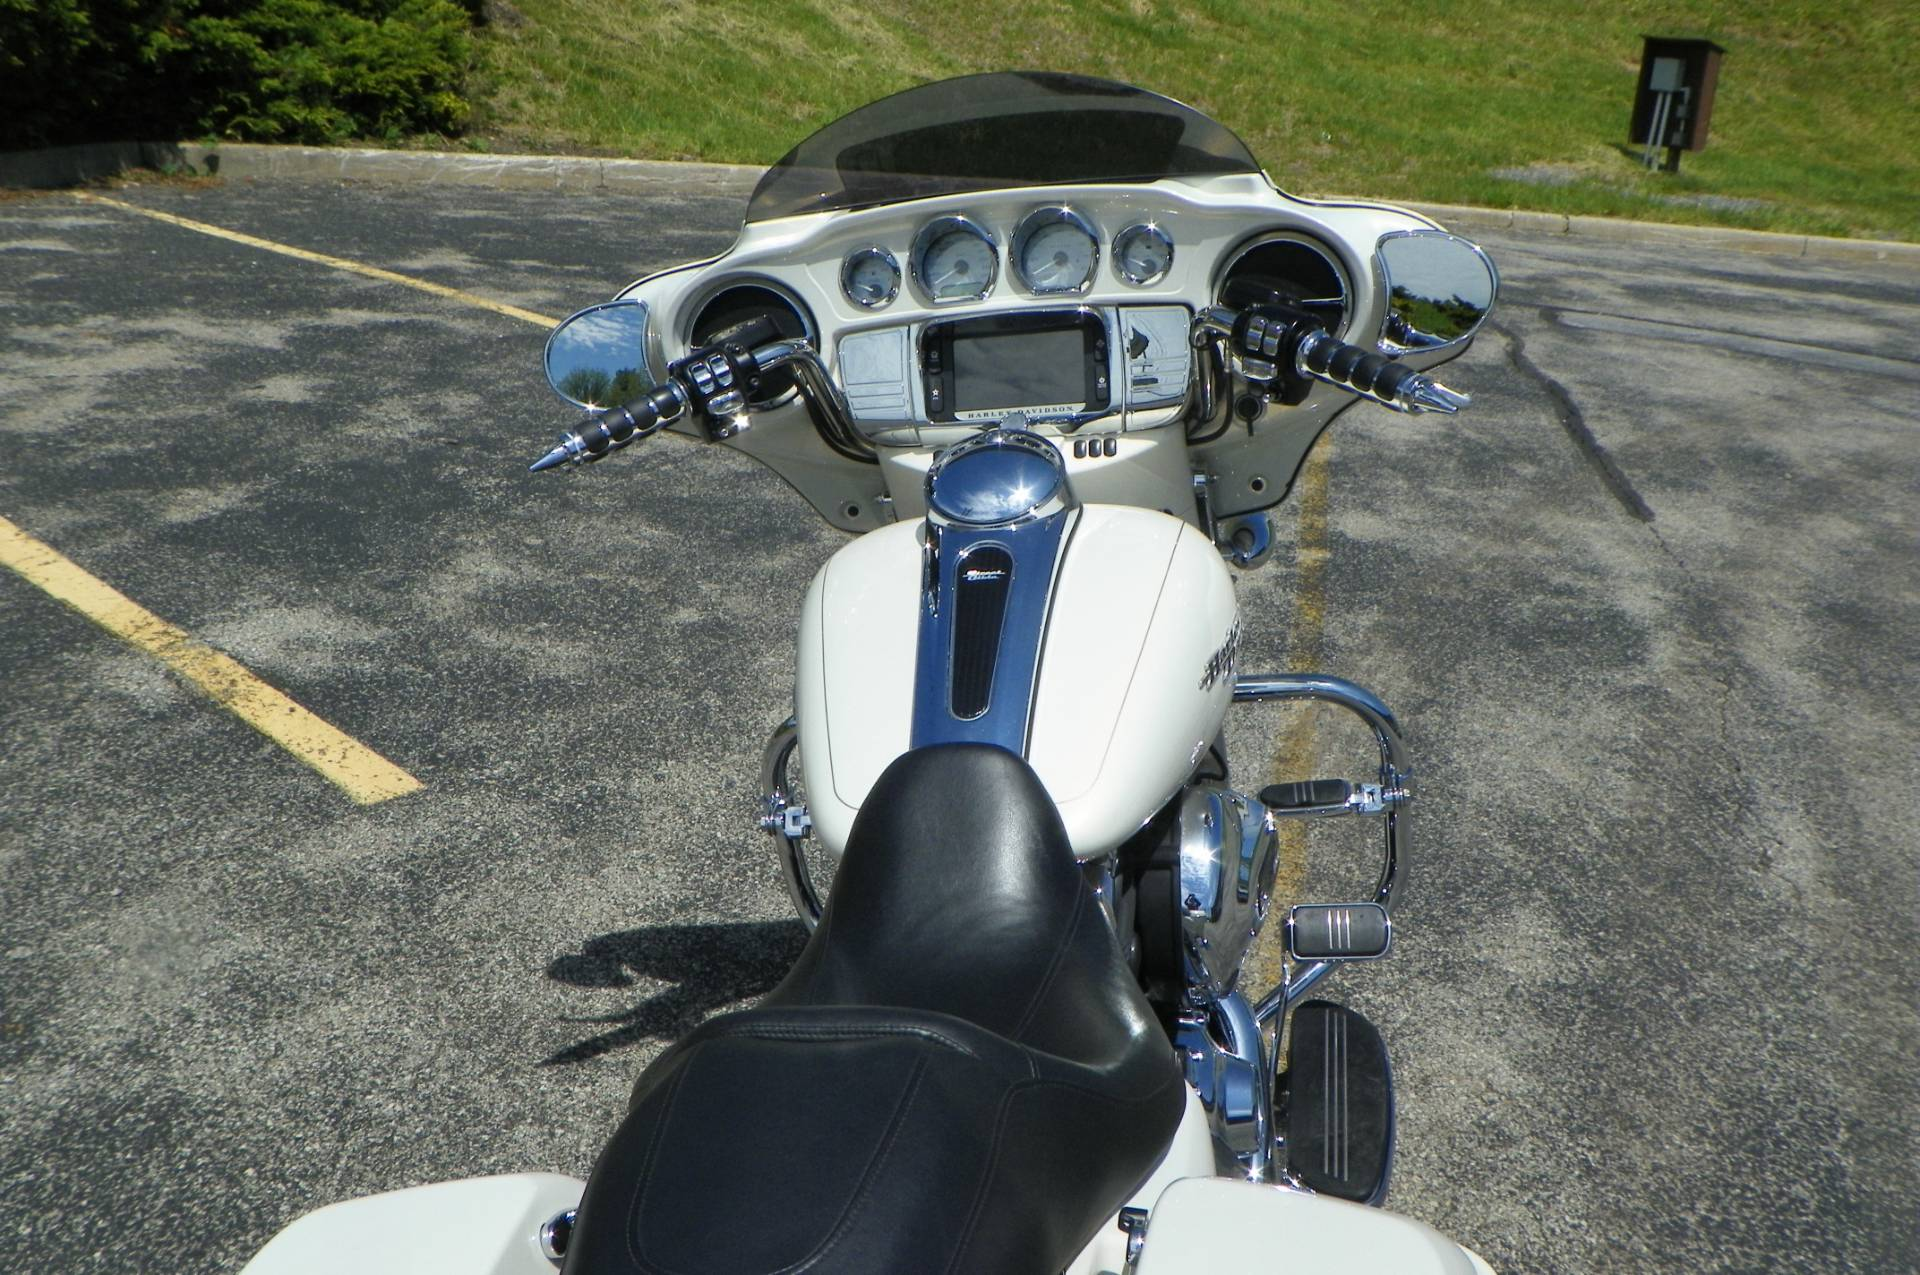 2015 Harley-Davidson Street Glide Special 6